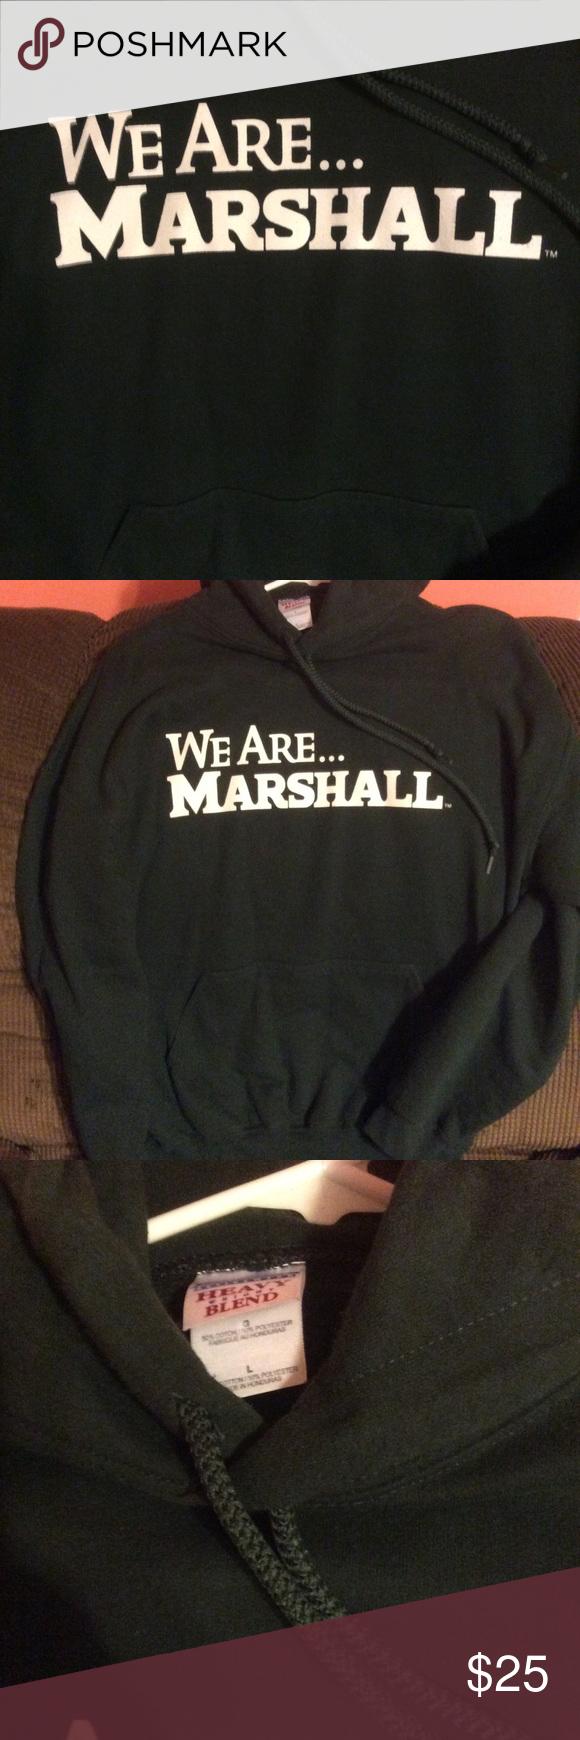 Marshall University Hoodie Size L Excellent Condition Worn Once Gildan Shirts Sweatshirts Hoodies Hoodies Sweatshirt Shirt Marshall University [ 1740 x 580 Pixel ]